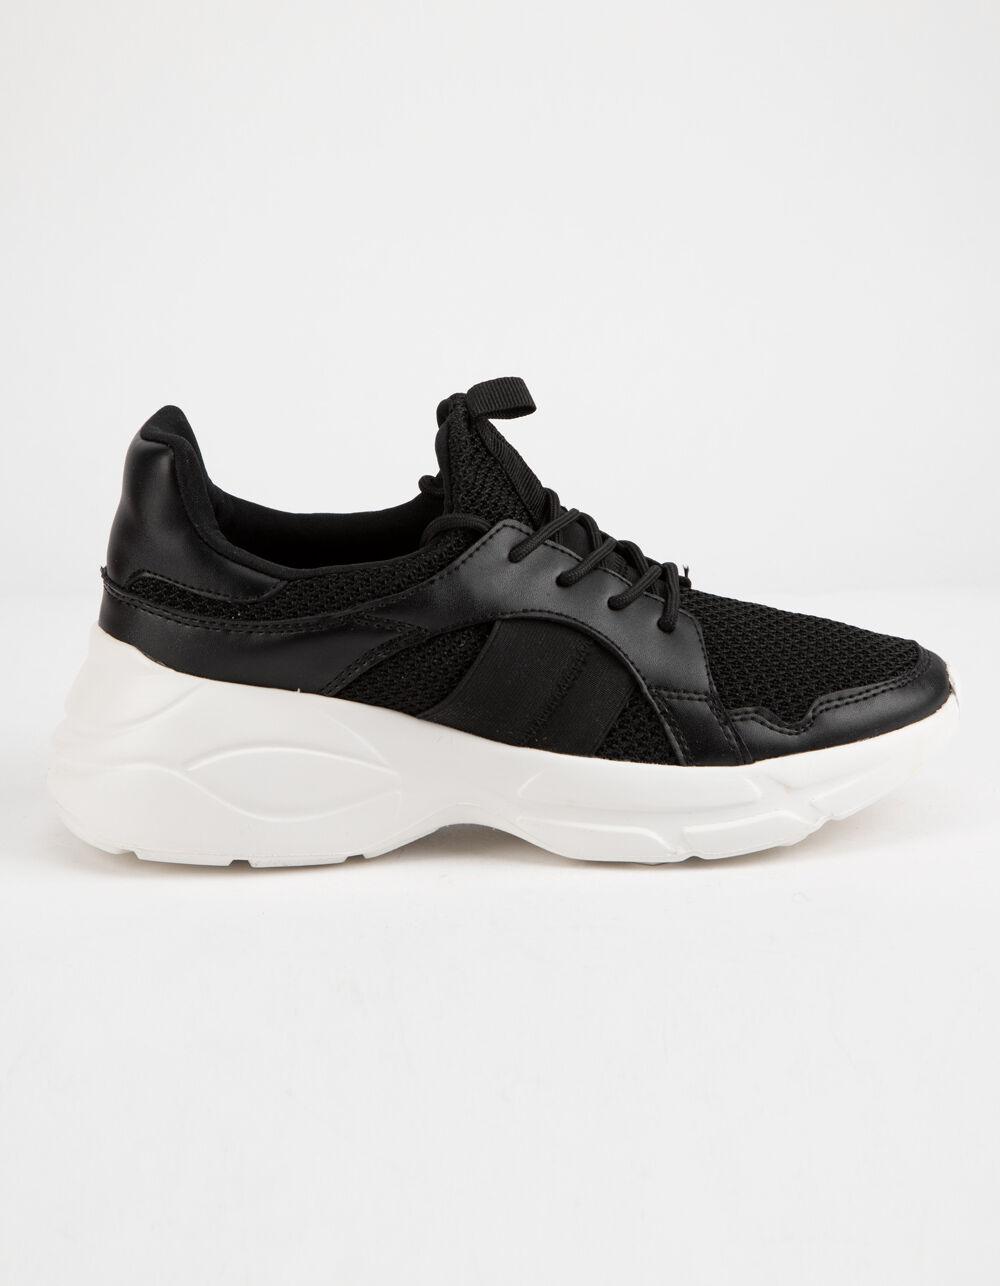 QUPID Piers Black & White Shoes